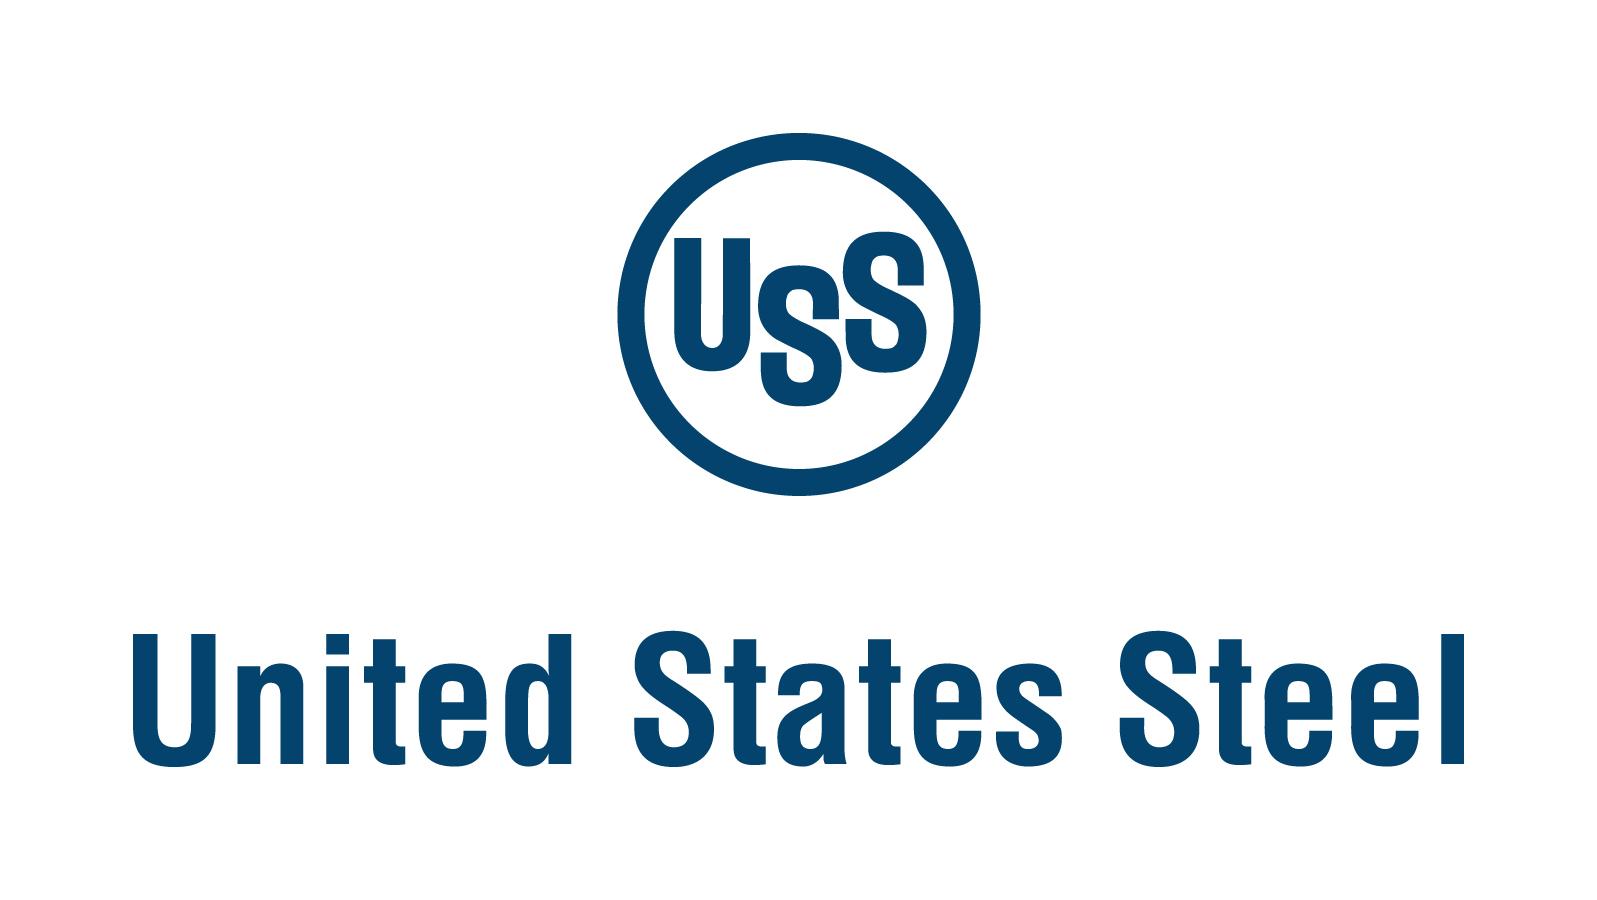 United States Steel Corporation logo